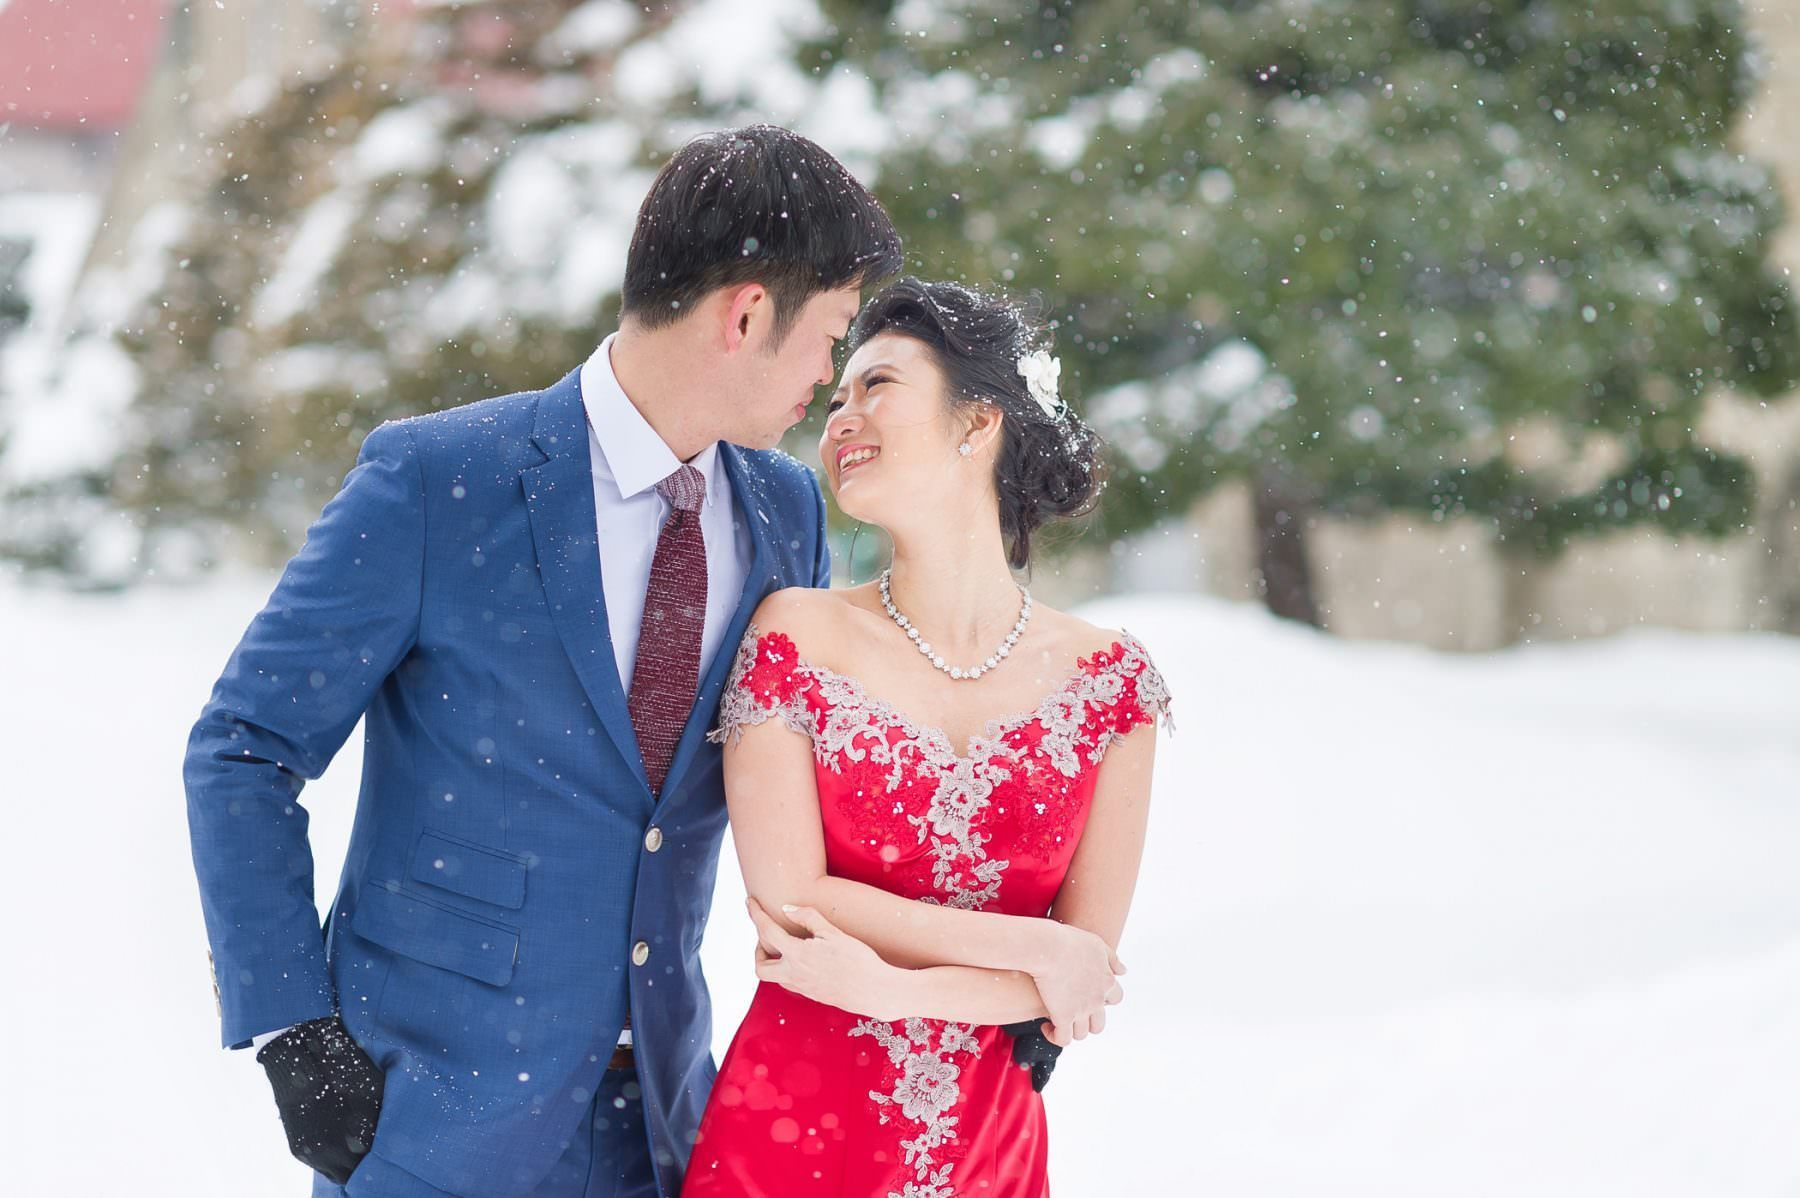 Photography: John 15 Photography  #prewedding #hokkaido #北海道 #前撮り